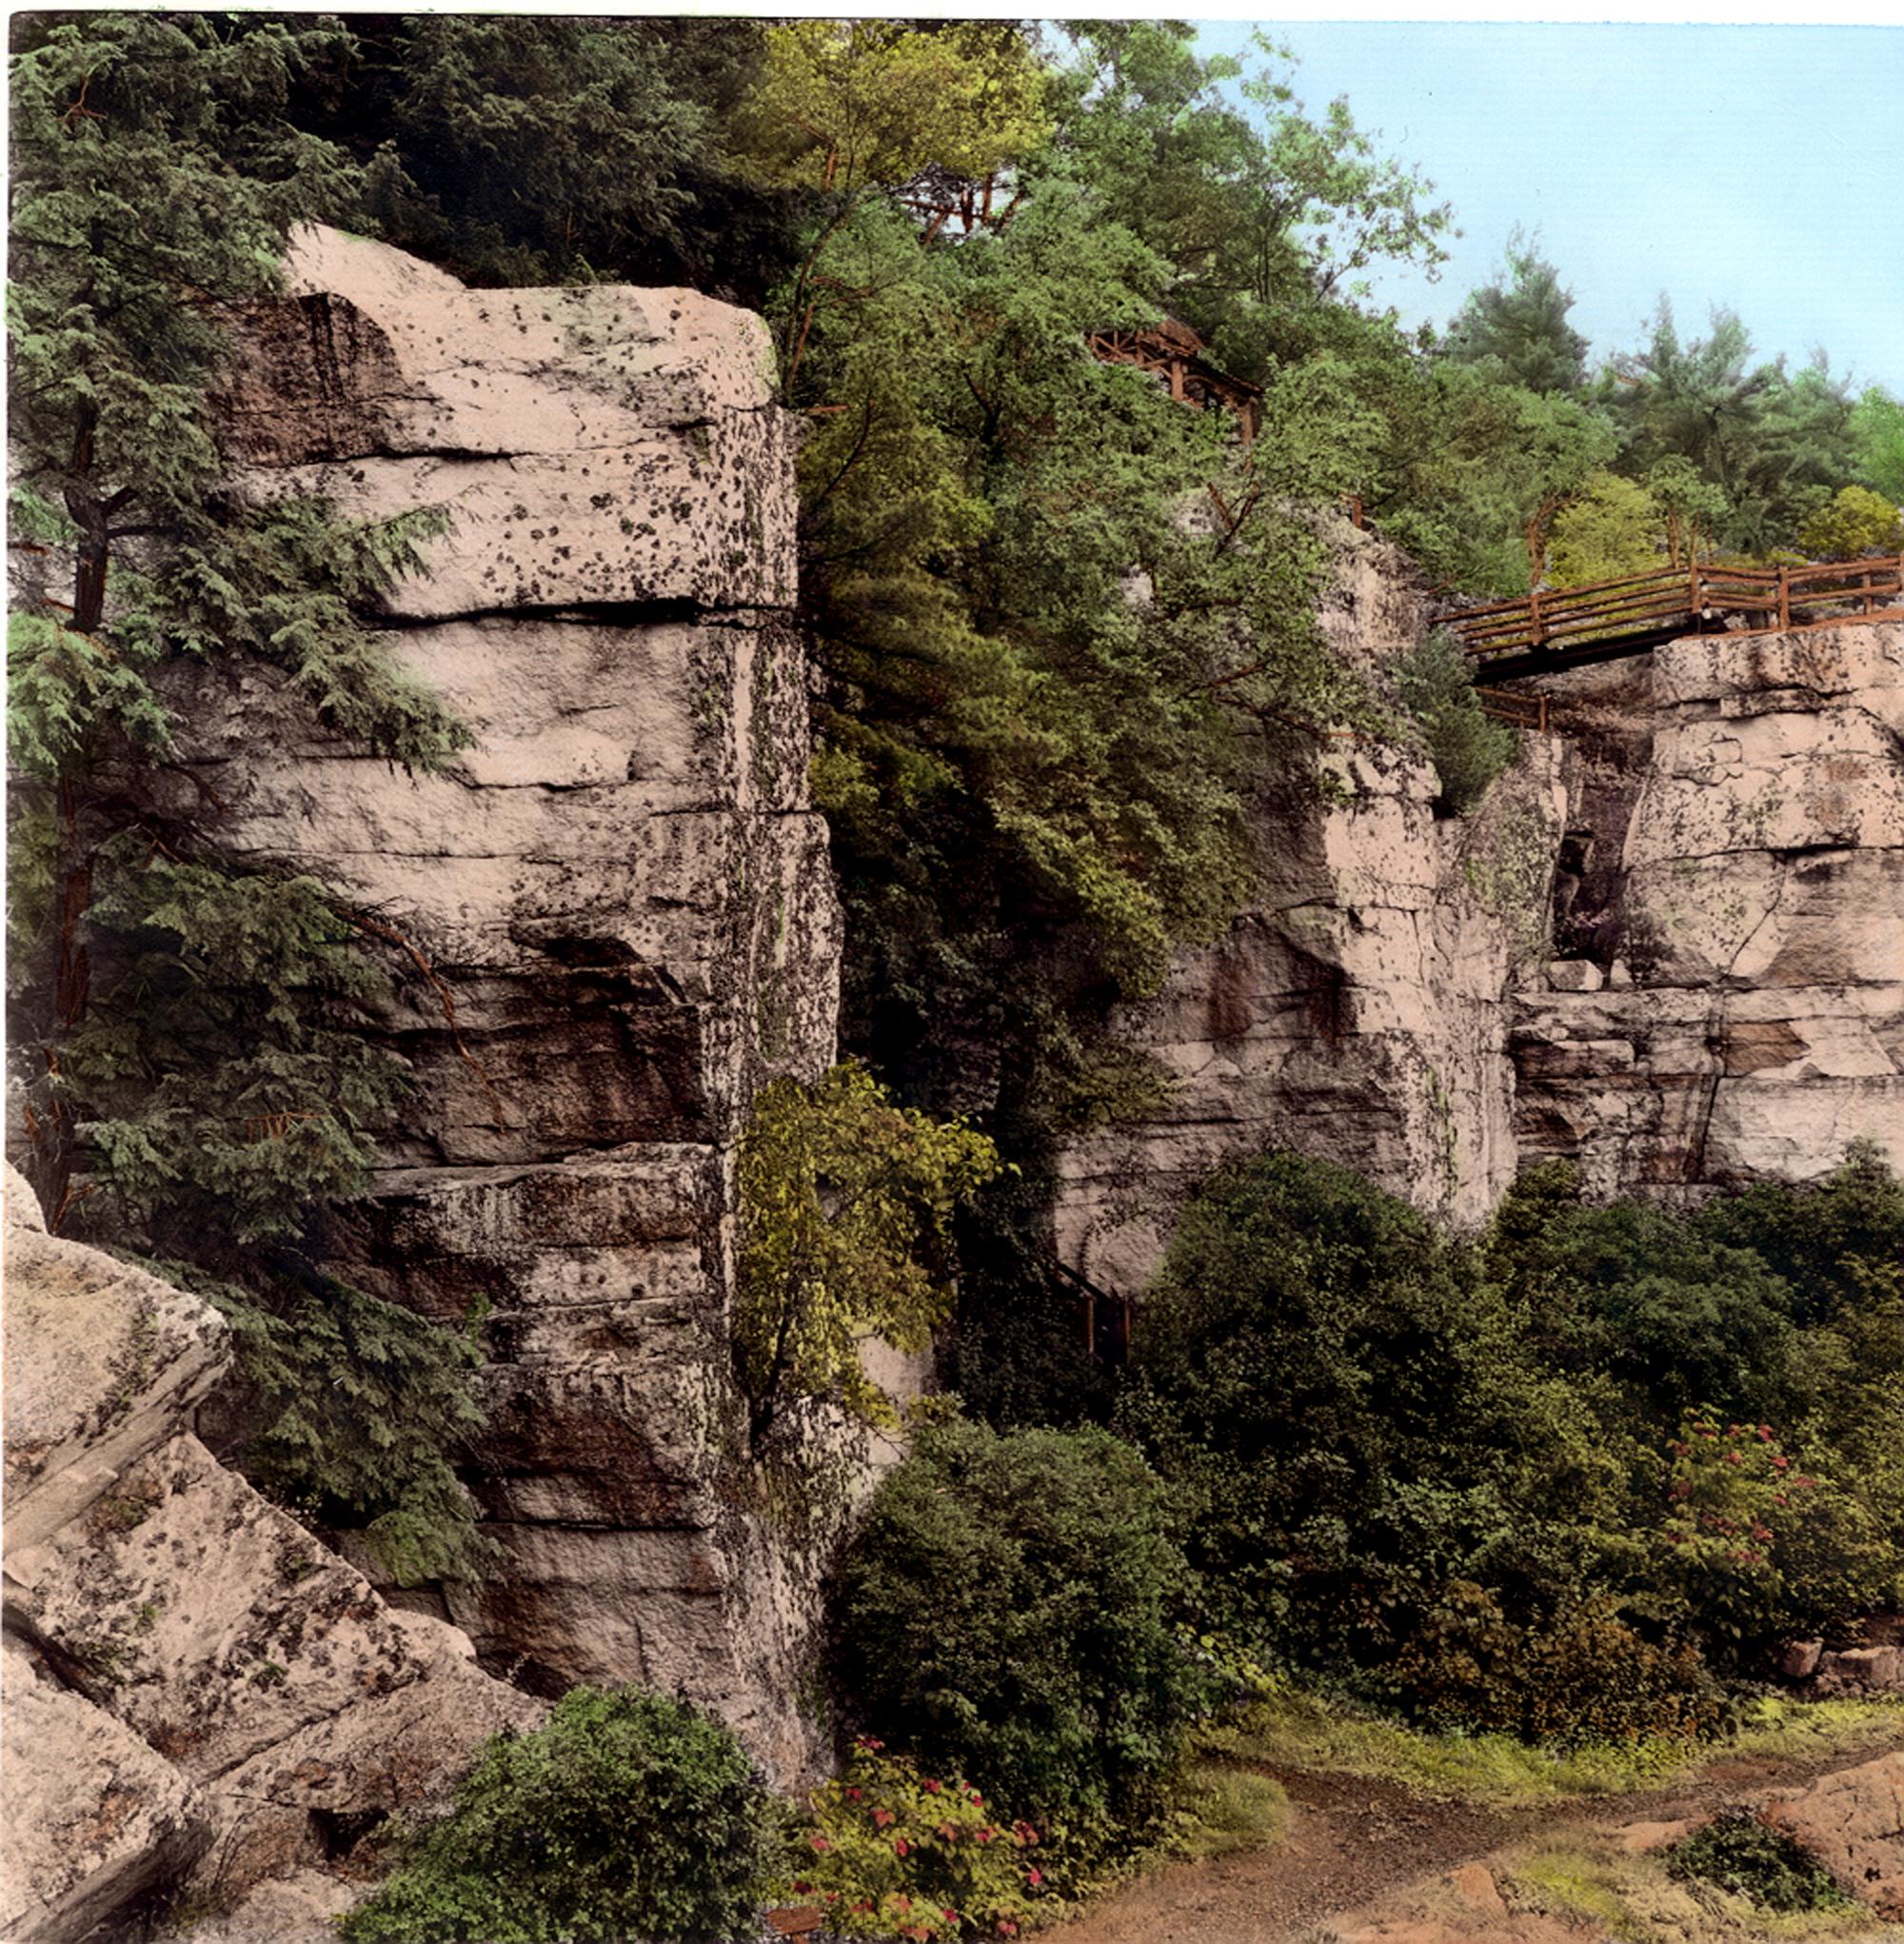 Mohonk Rock